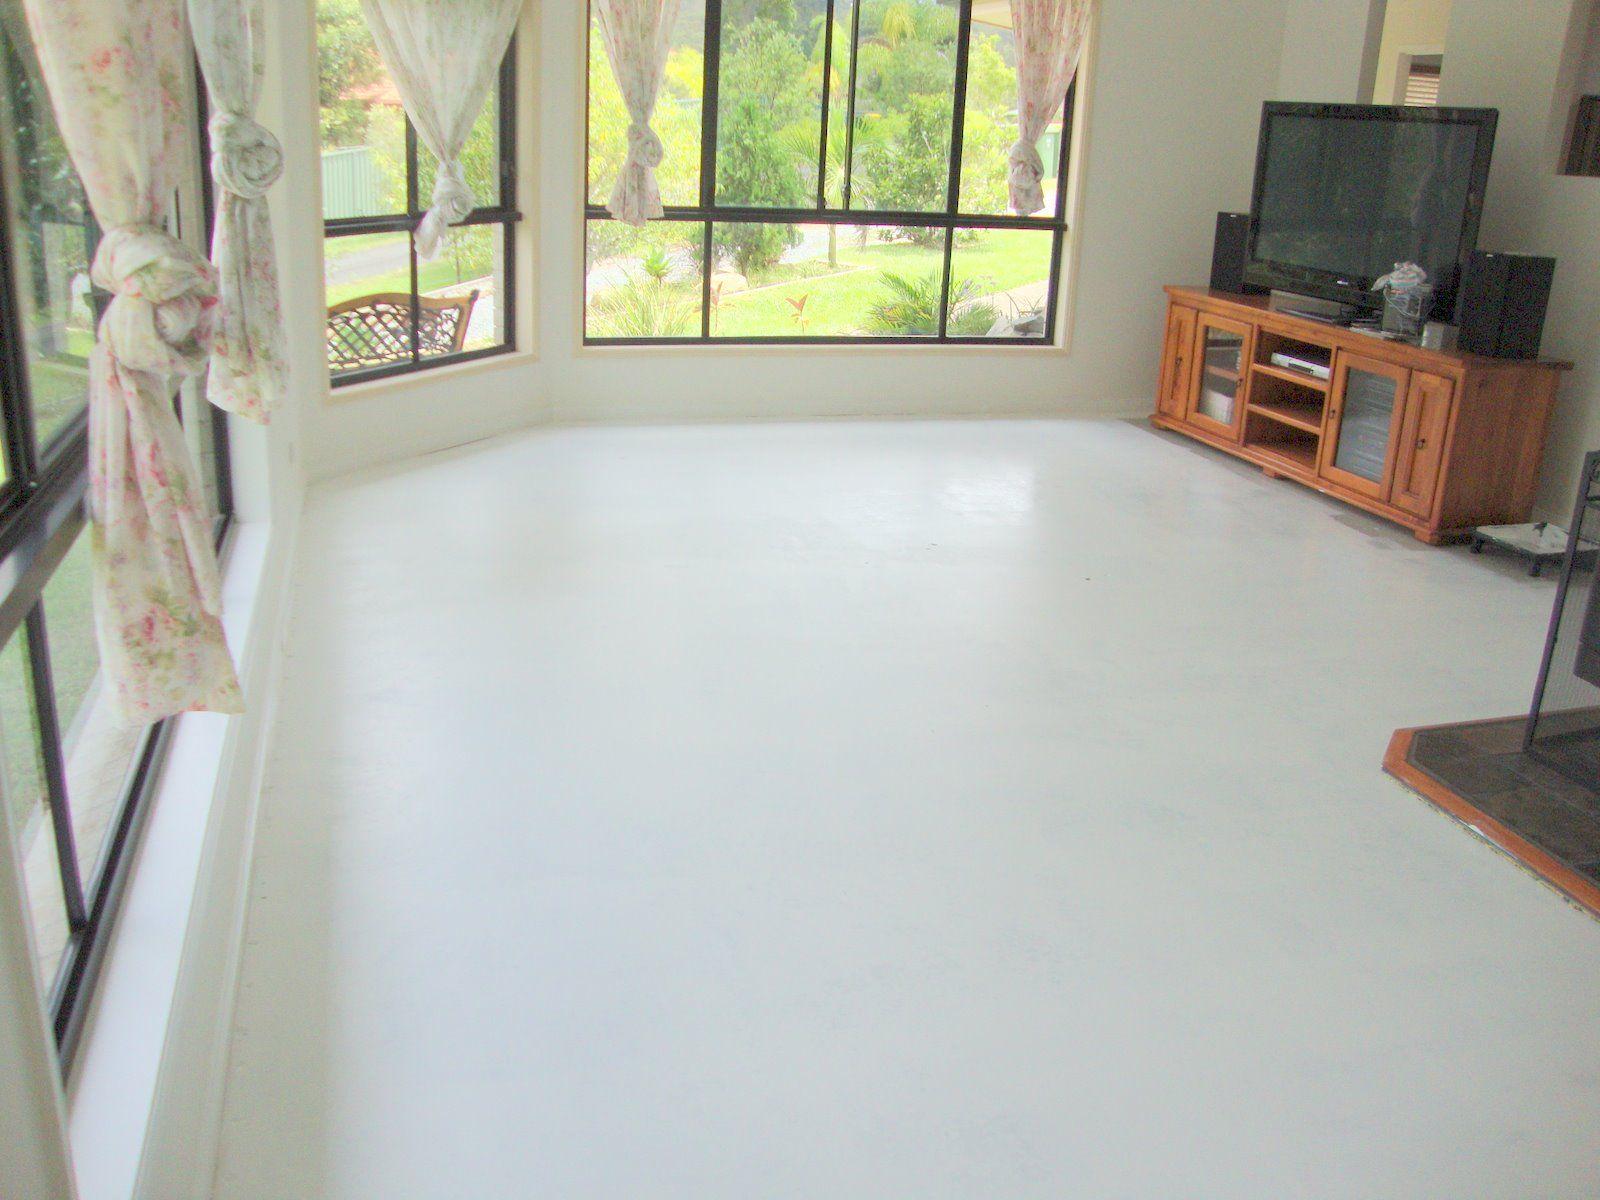 White Painted Concrete Floor Google Search Basement Concrete Floor Paint Painted Concrete Floors Painting Basement Floors